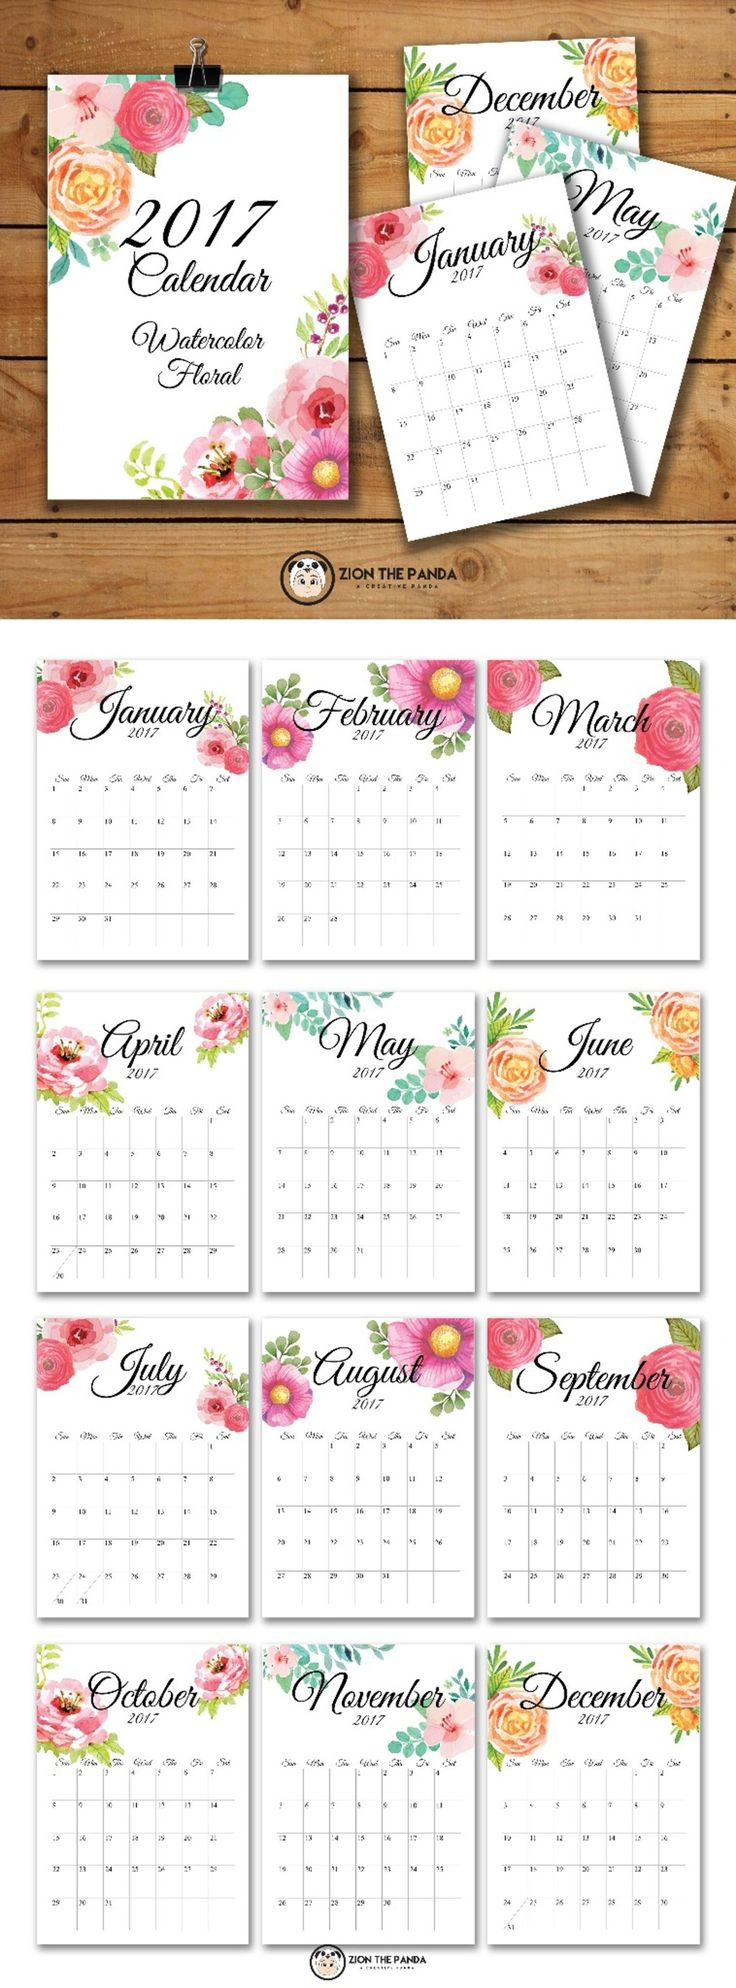 2017 Monthly Calendar - Floral (printable) - Zion The Panda                                                                                                                                                                                 Mais